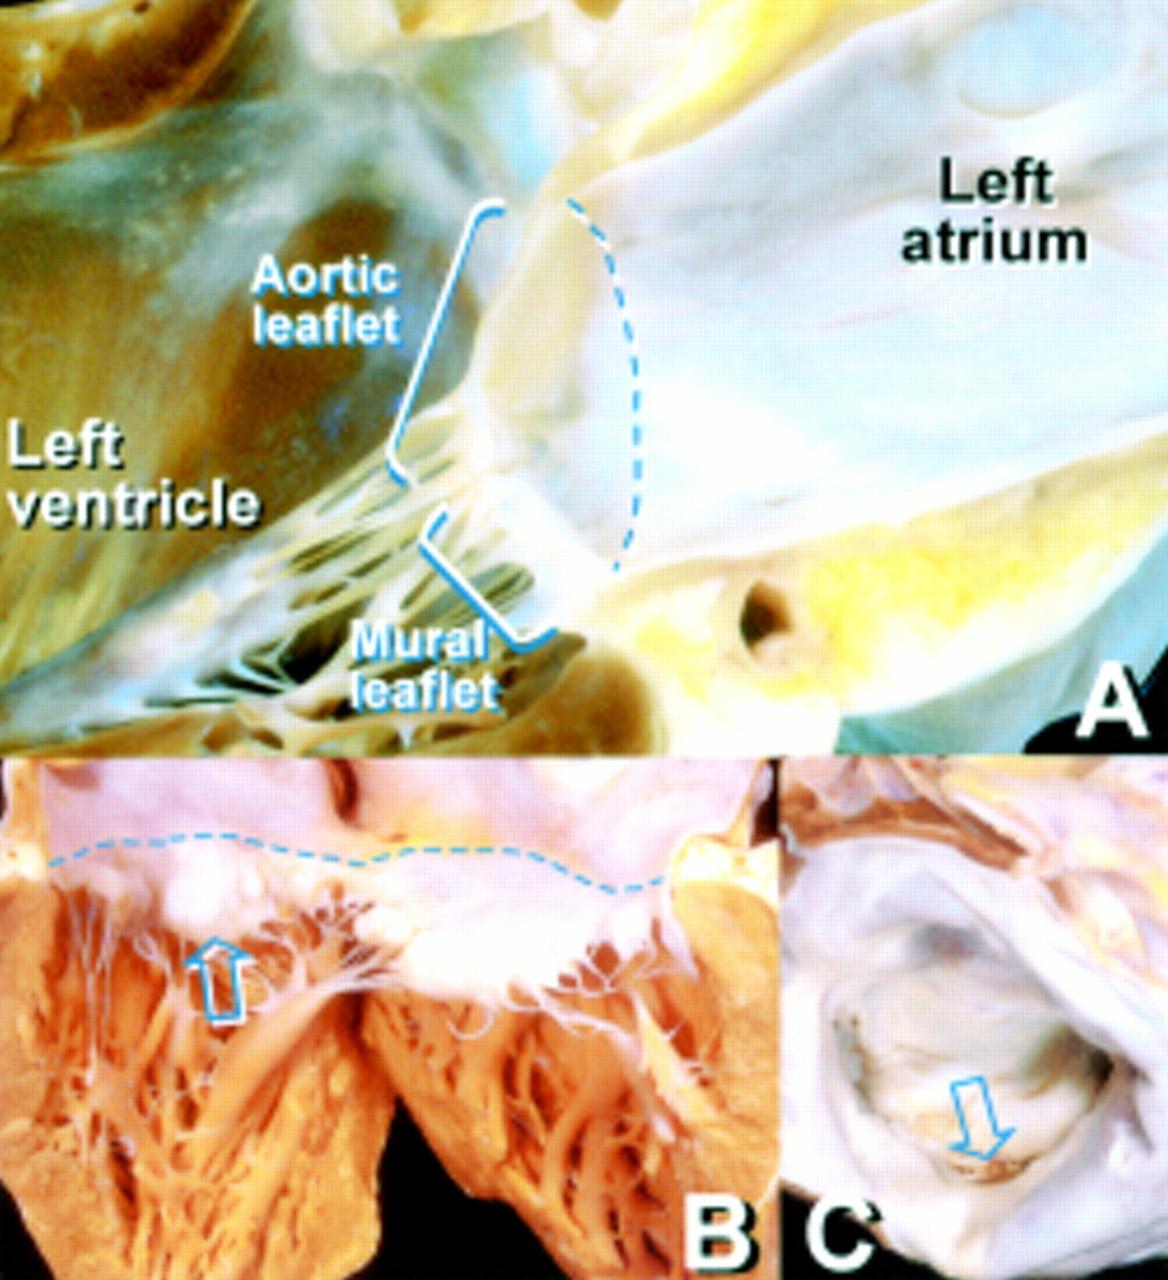 Anatomy Of The Mitral Valve Heart